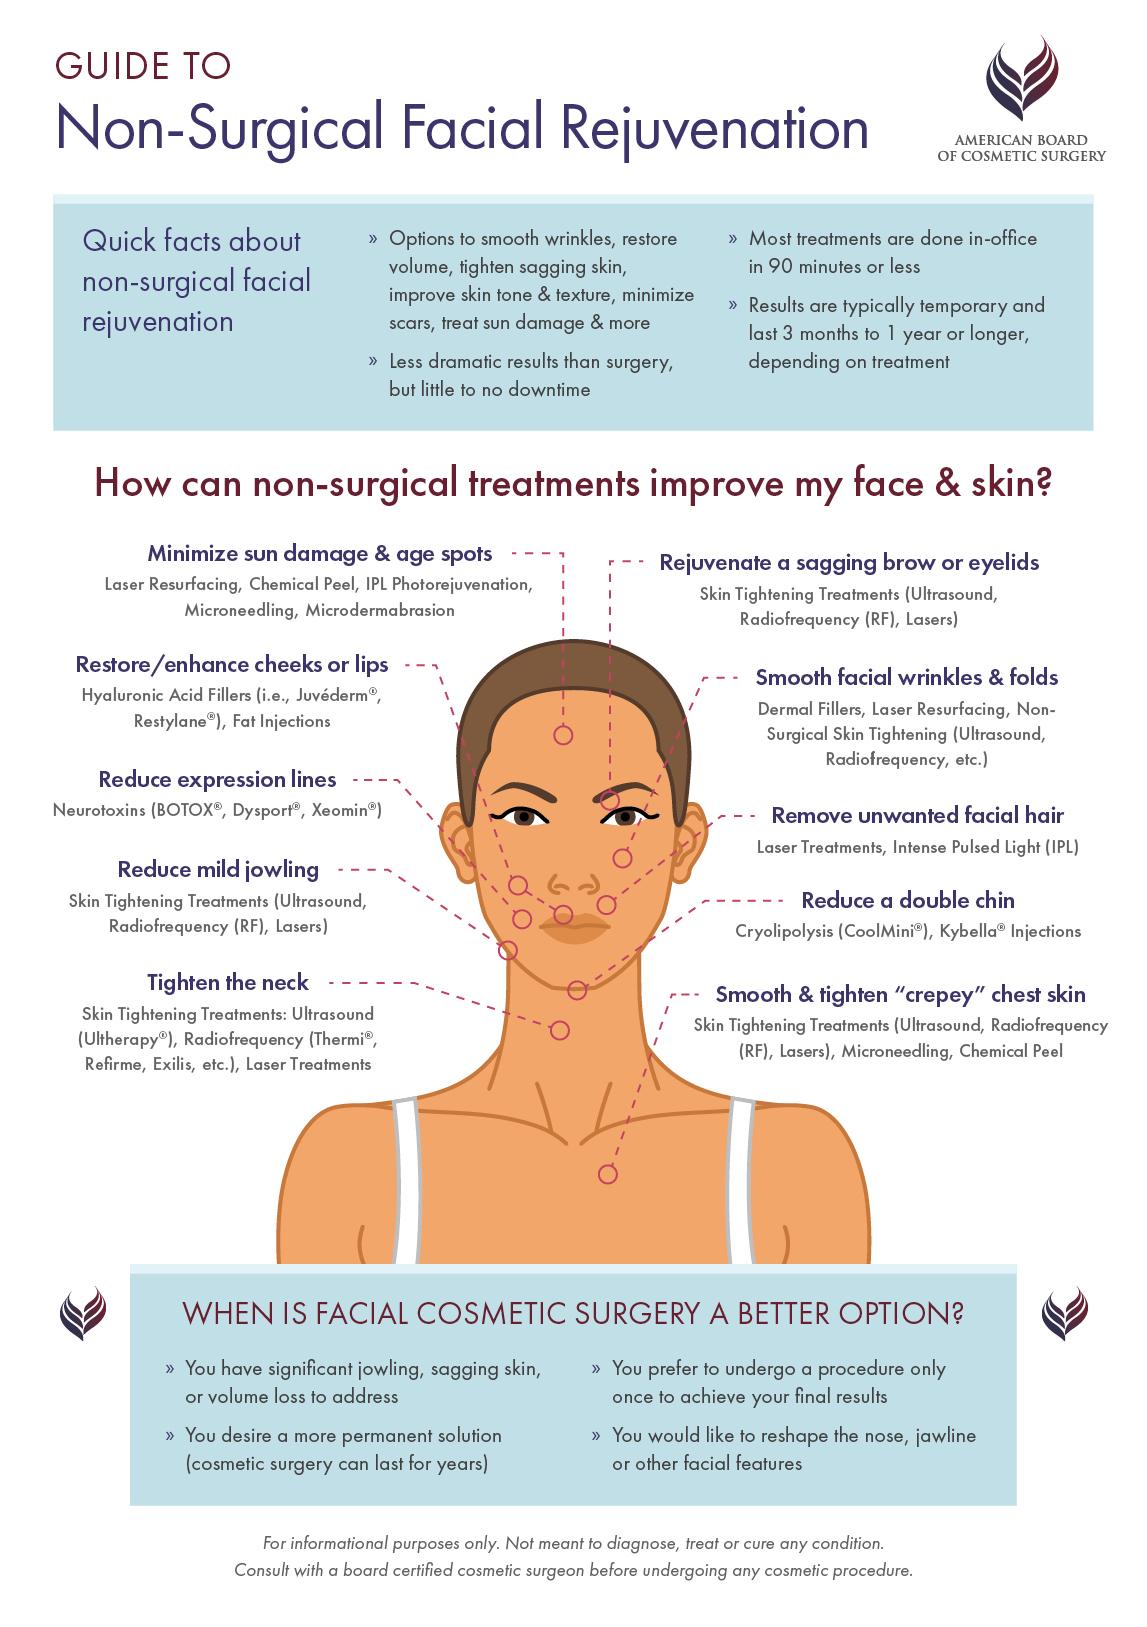 Guide to Non-Surgical Facial Rejuvenation